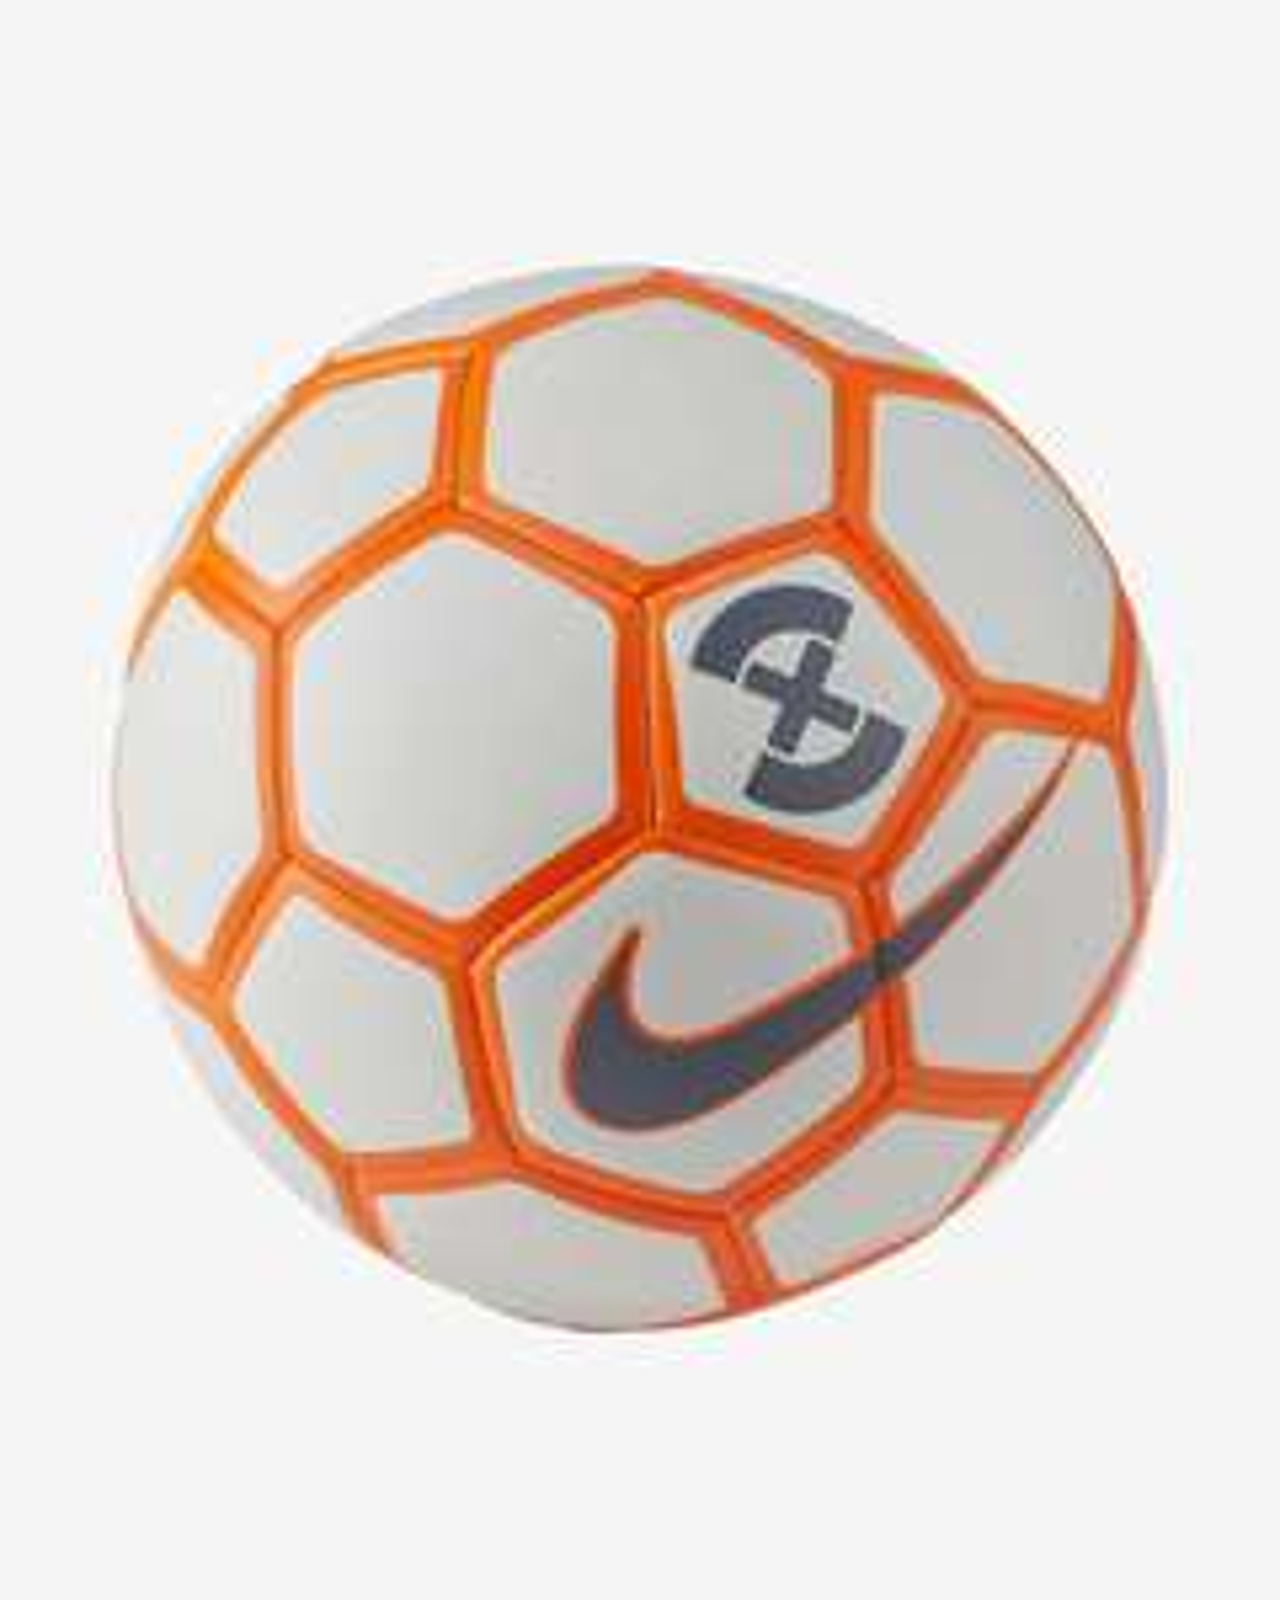 Nike Strike X Football size 5 Now £10.48 @ Nike.com